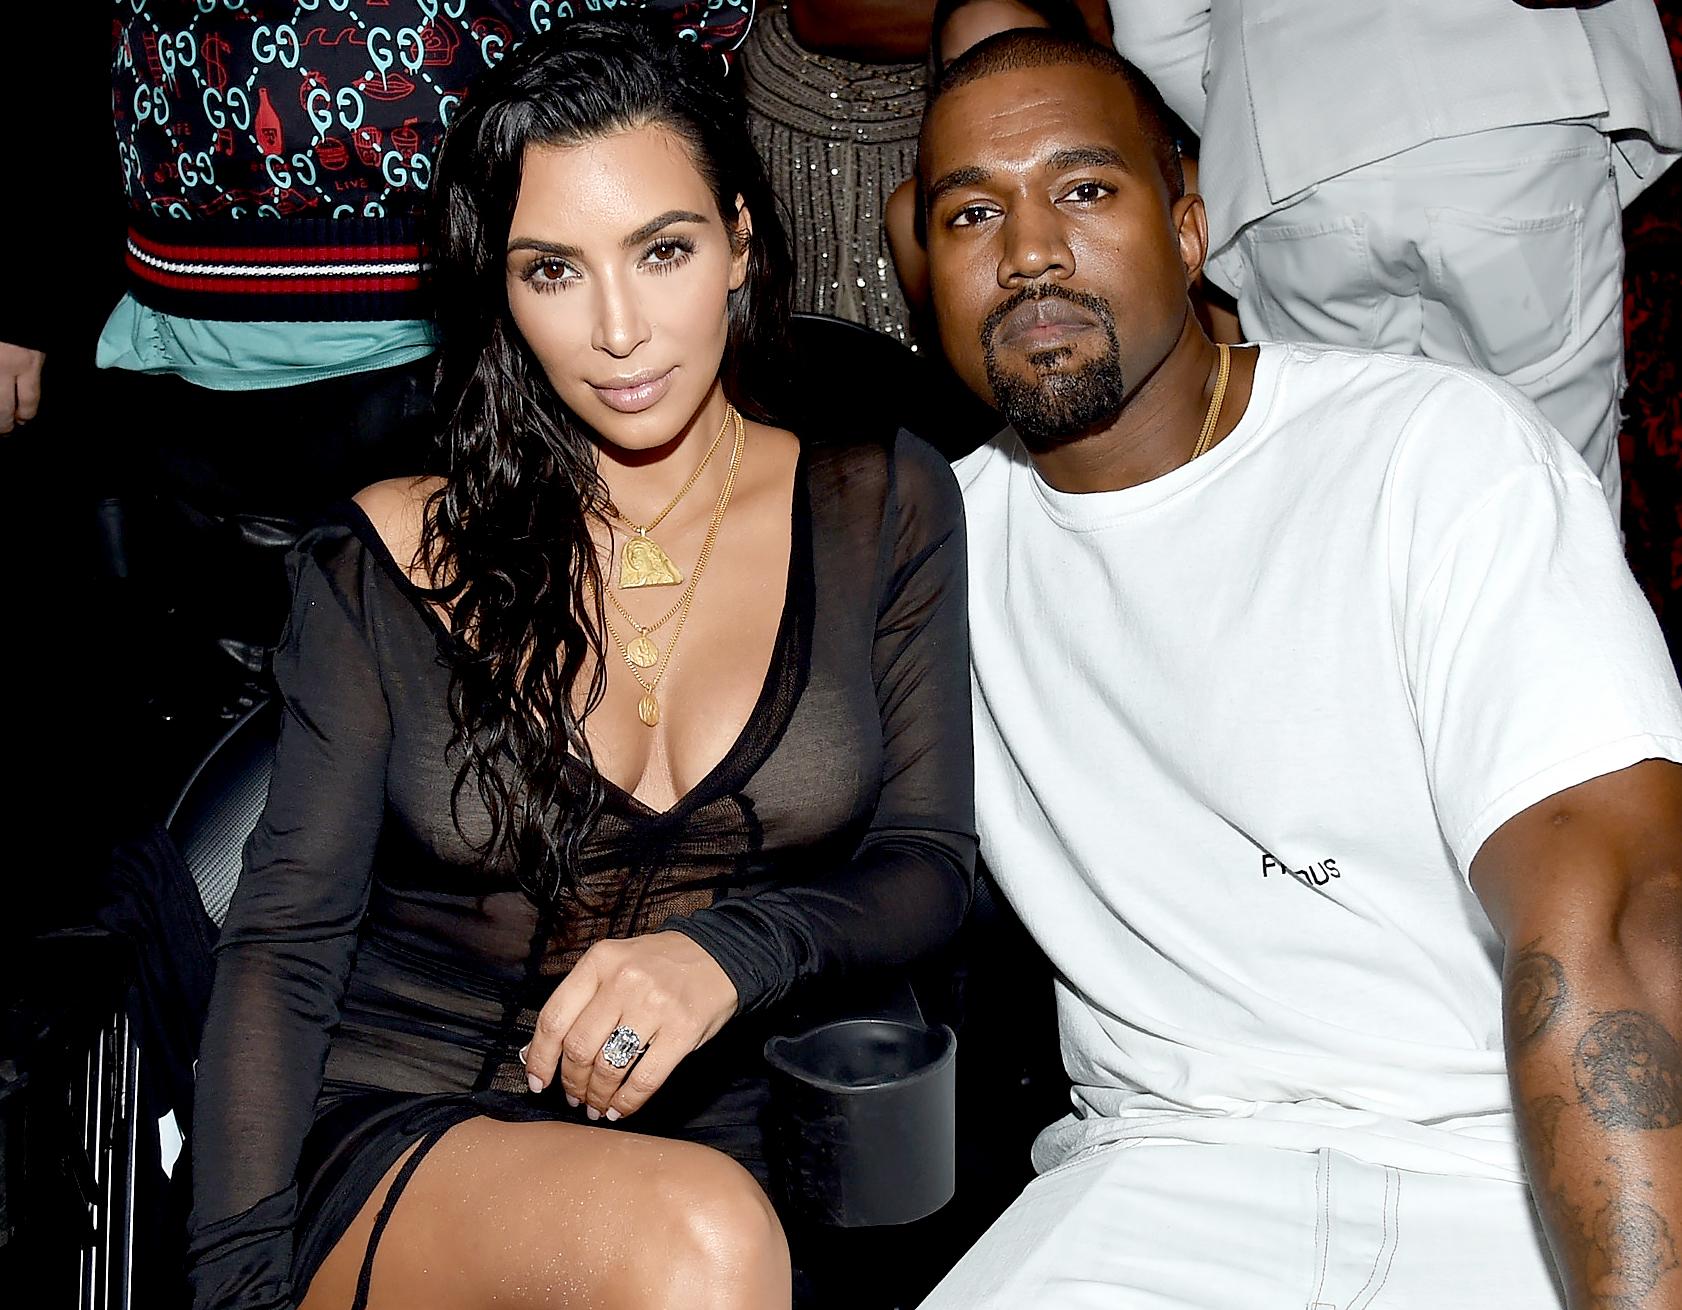 Kim Kardashian Tried To Slander Rhymefest, He Responded Eloquently